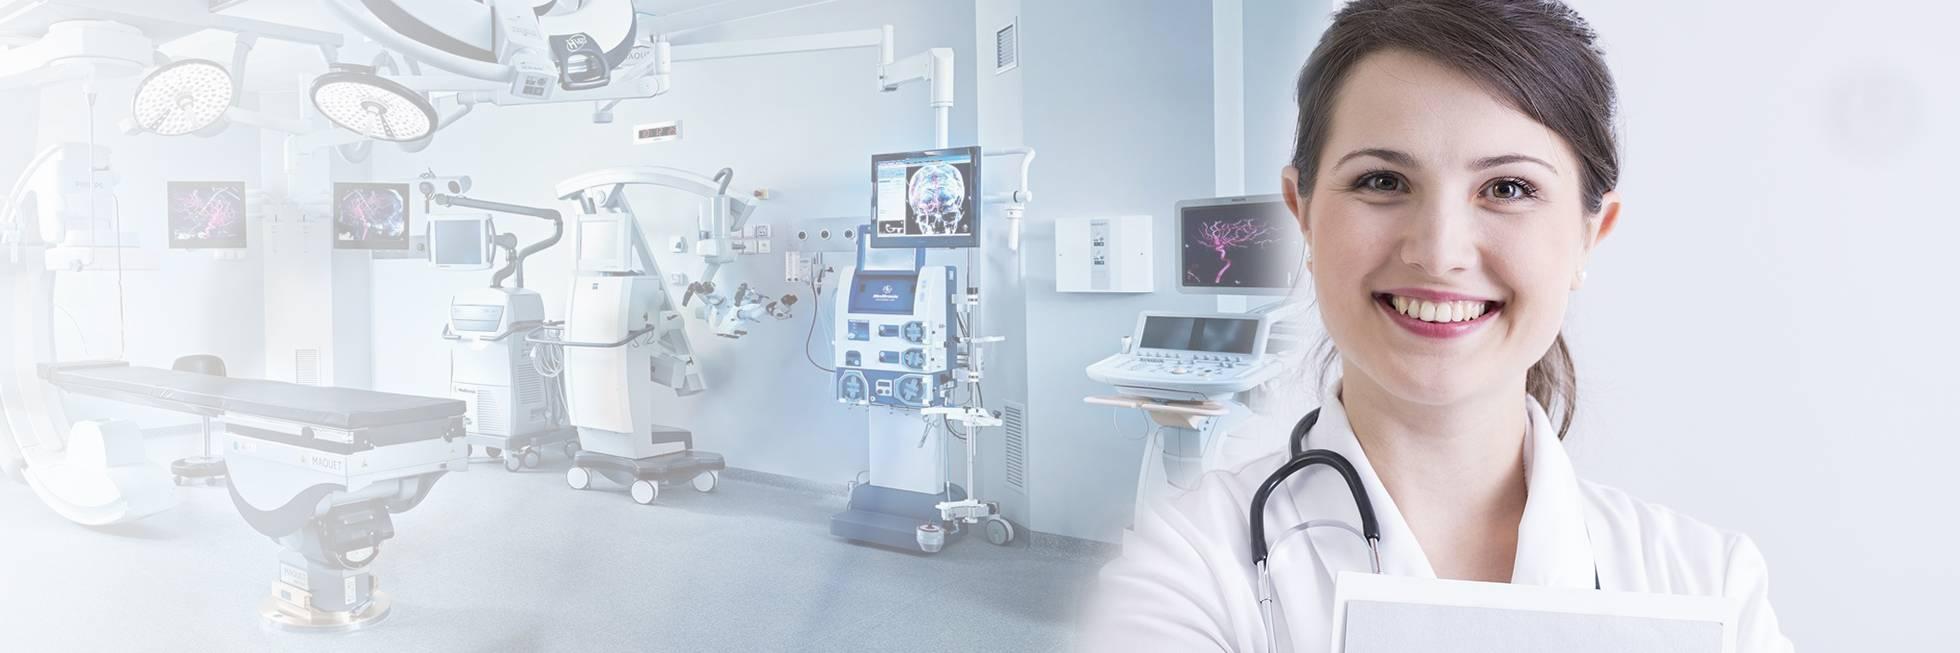 medical-equipment-financing-bg